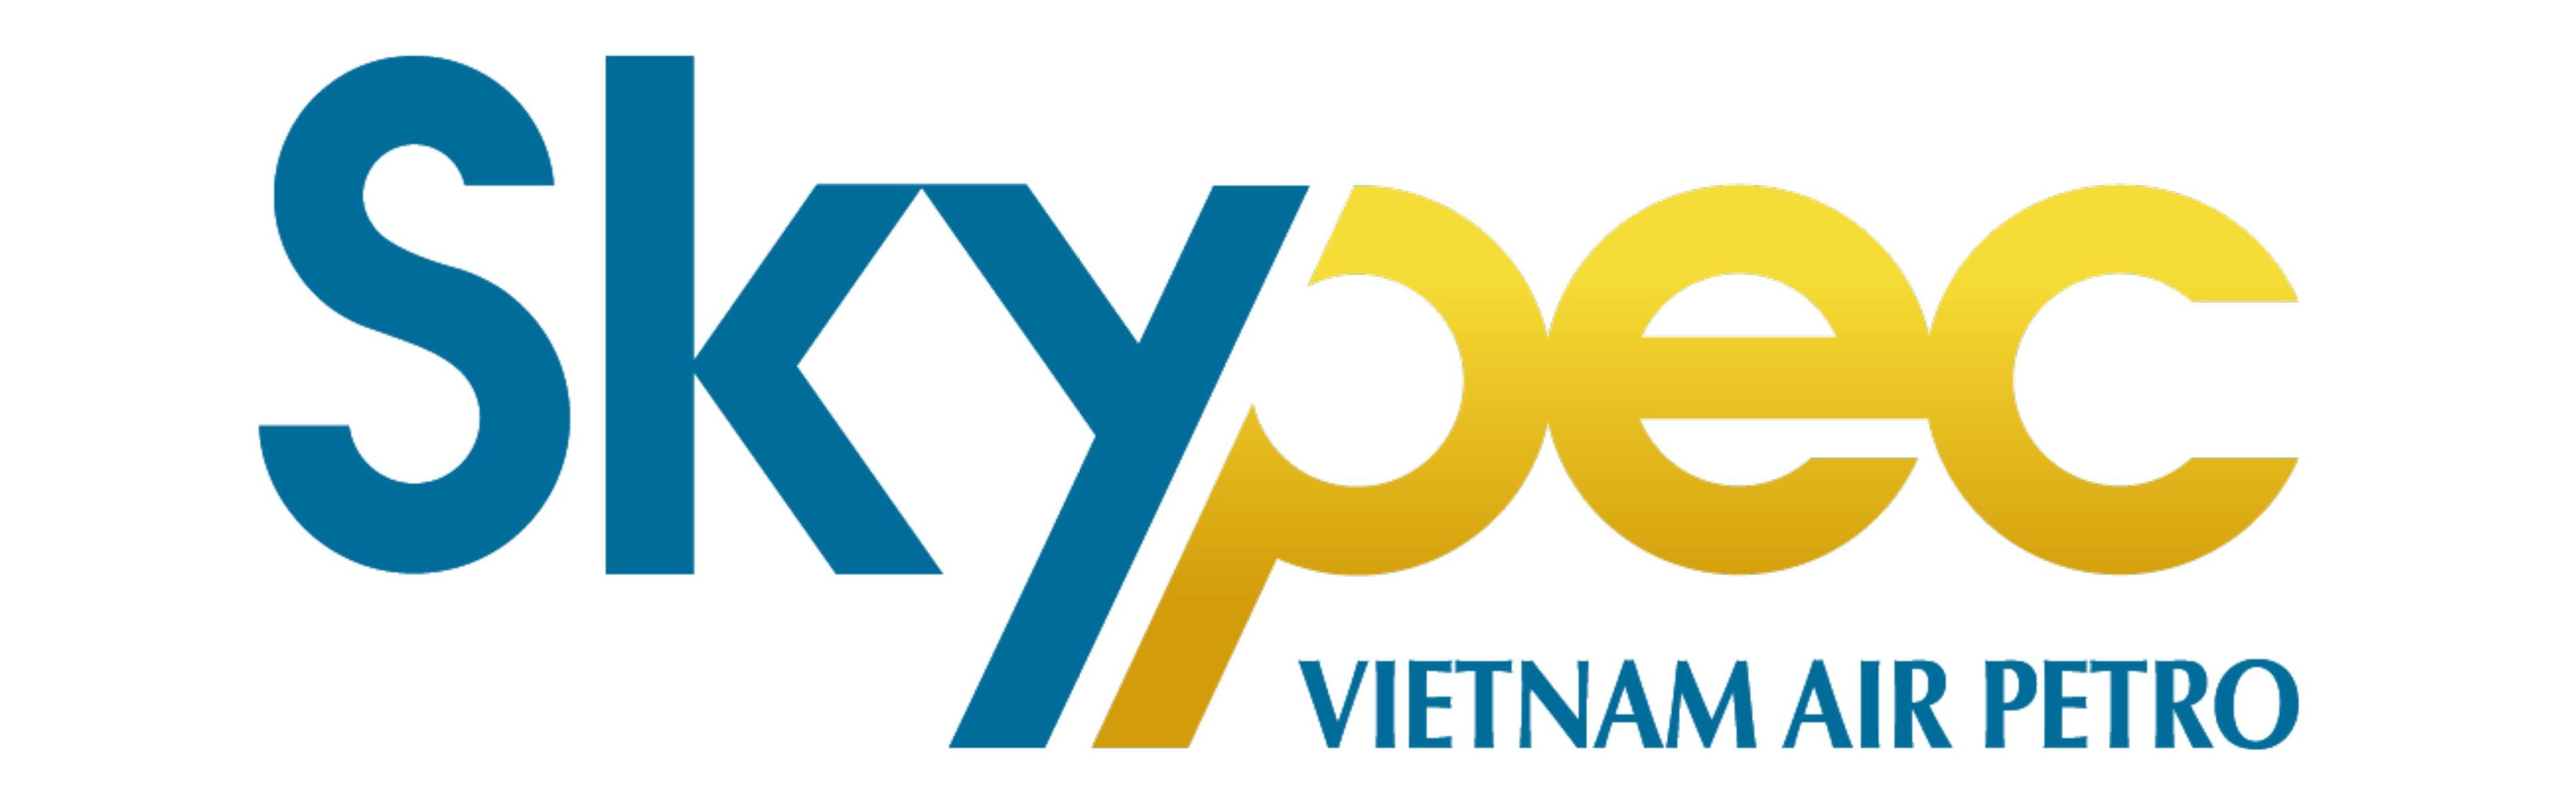 Vietnam Air Petrol Company Ltd (Skypec)